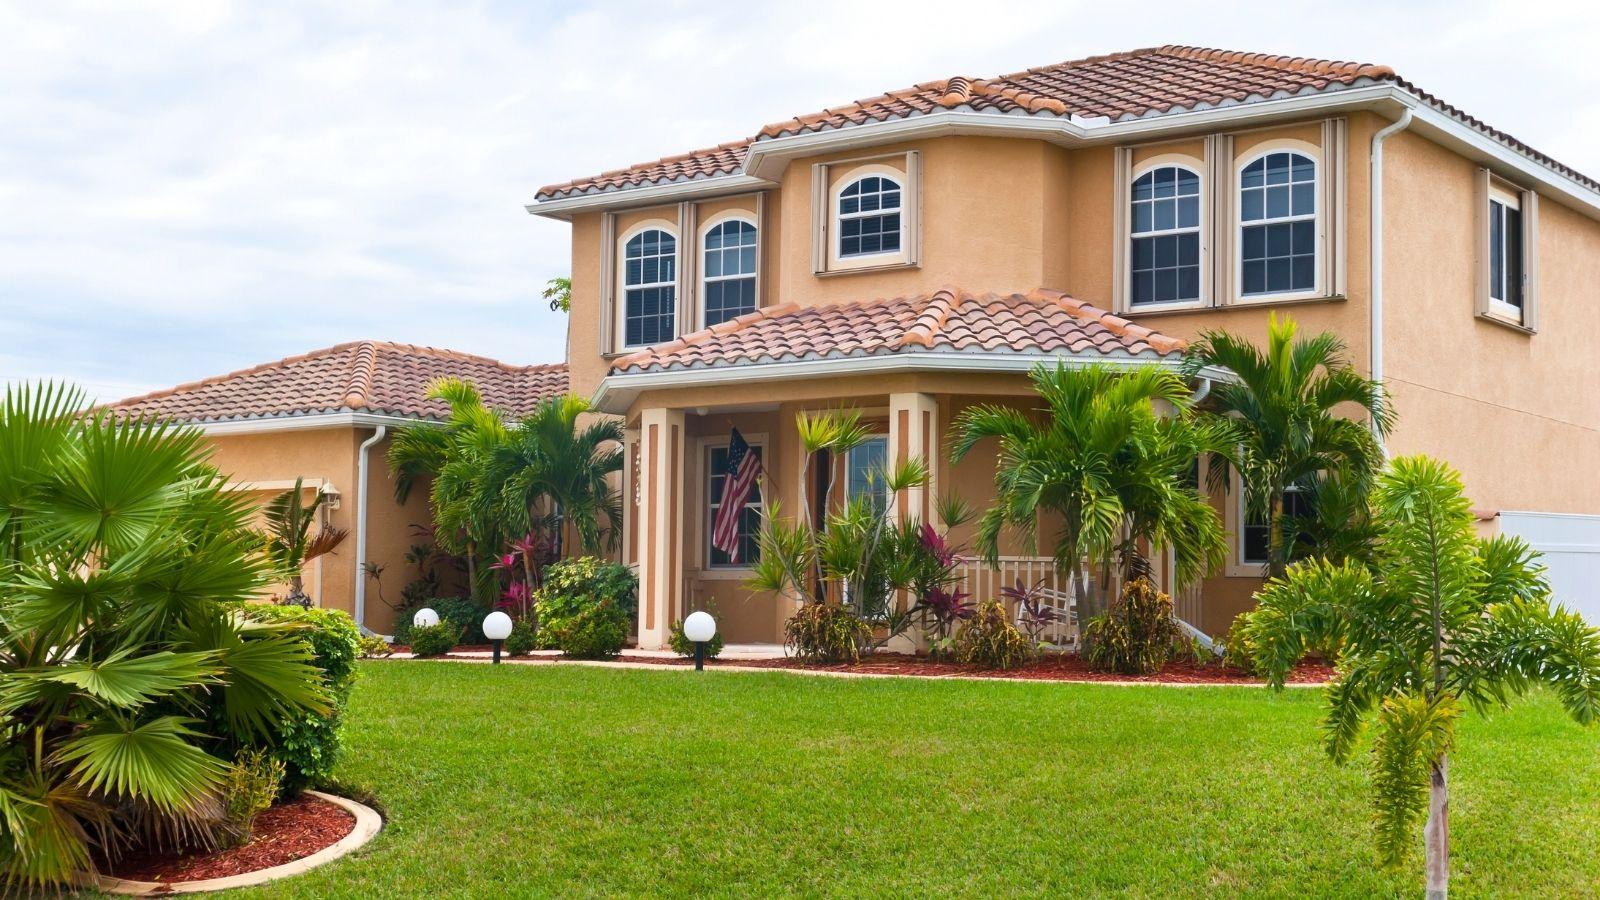 BUTTERKNIFE HOMES FOR SALE - SANIBEL ISLAND FL